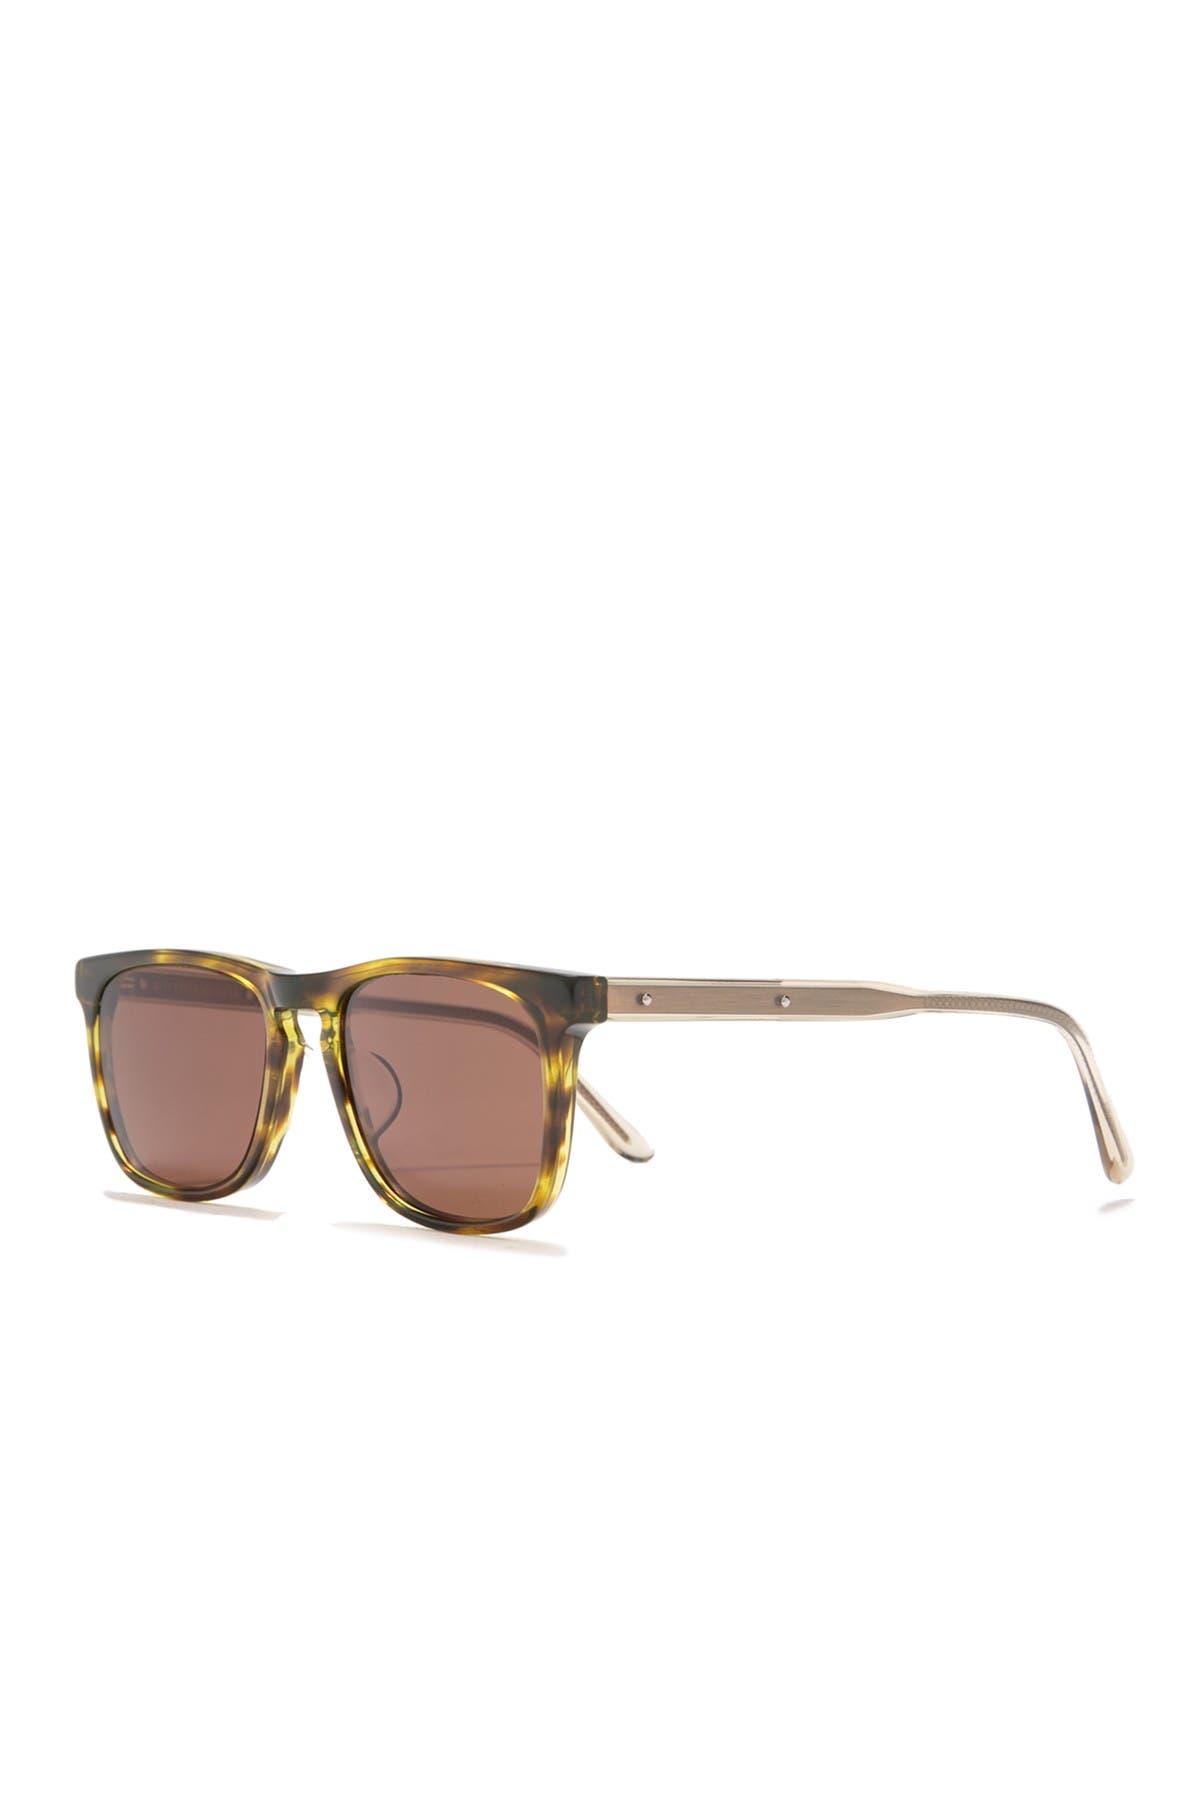 Image of Bottega Veneta 52mm Square Sunglasses